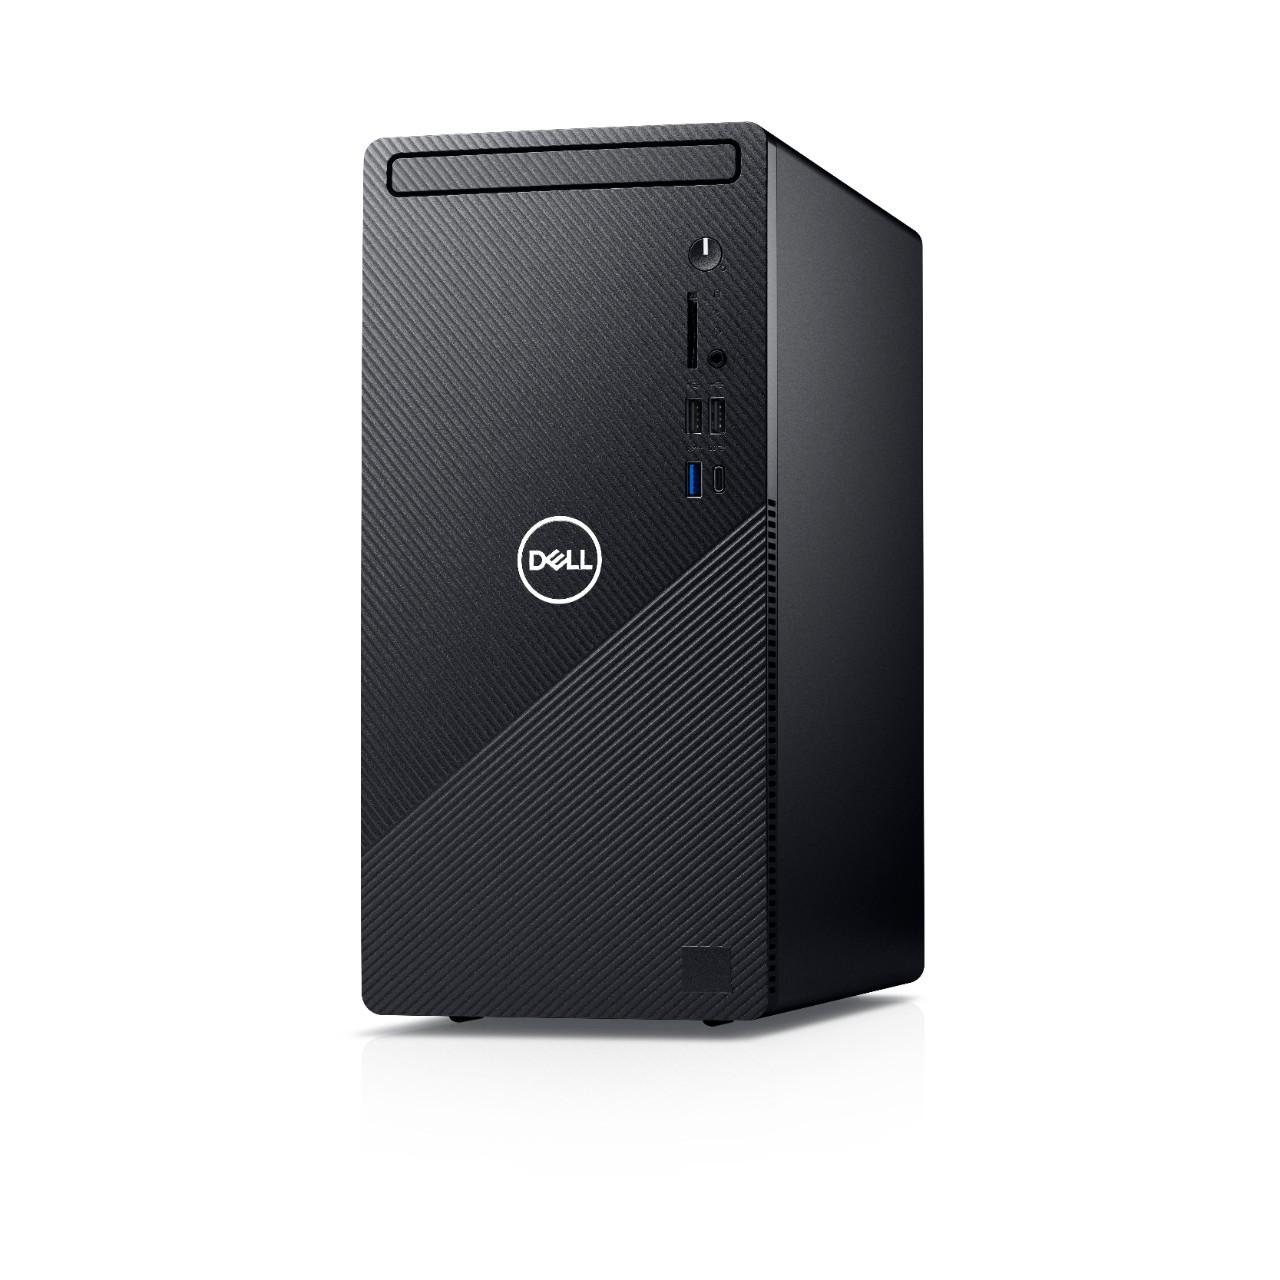 Dell Inspiron DT 3891 i5-10400/8GB/256SSD+1TB/DVD/W10Pro/3RNBD/Černý - 3891-38002